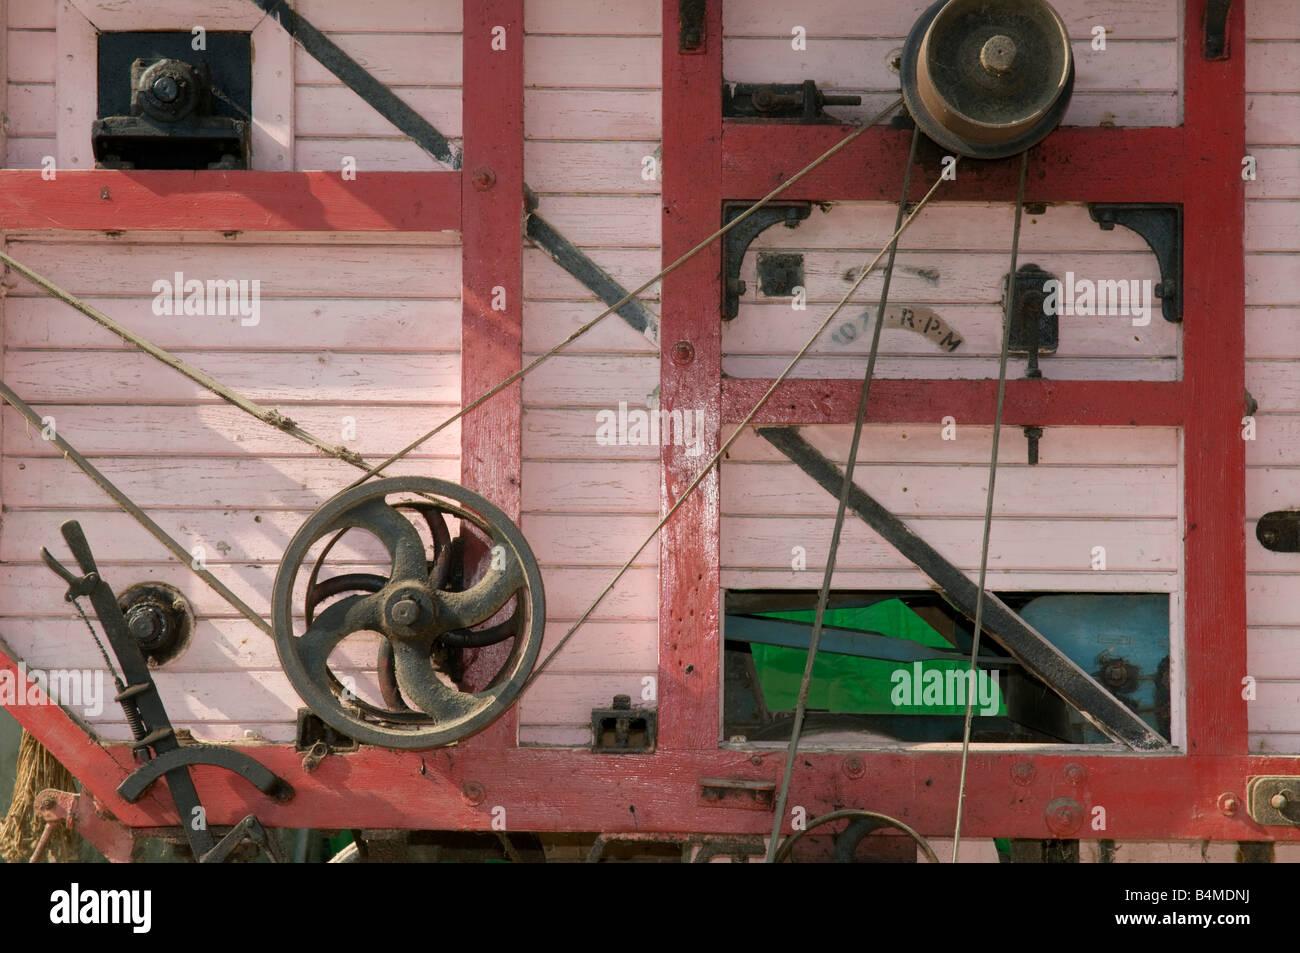 Detail of old belt driven threshing machine, - Stock Image